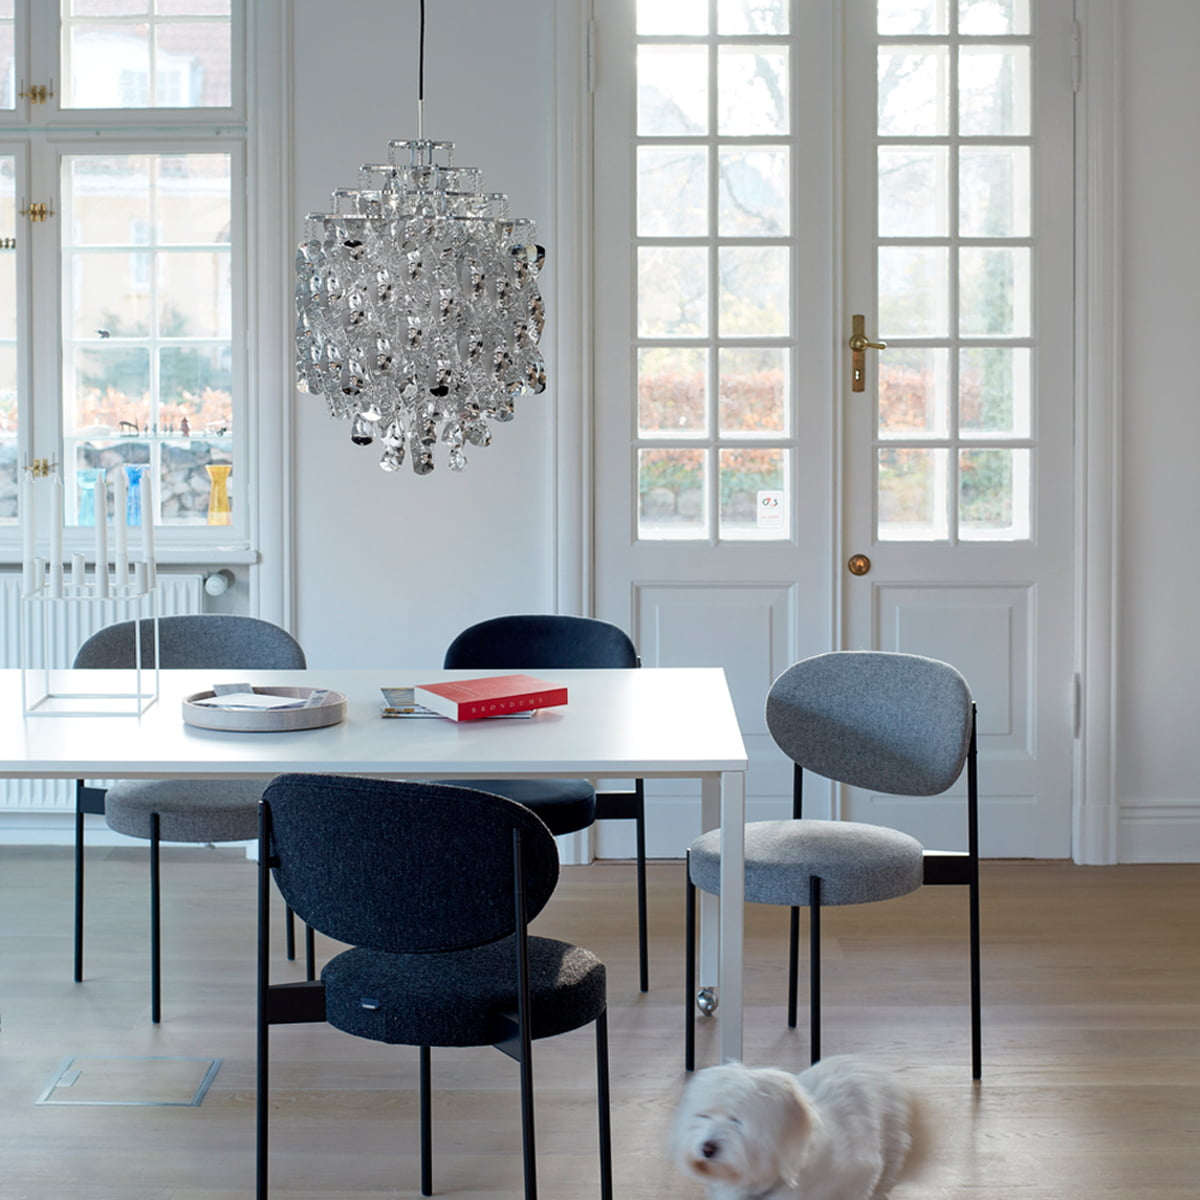 spiral sp01 pendelleuchte von verpan connox. Black Bedroom Furniture Sets. Home Design Ideas